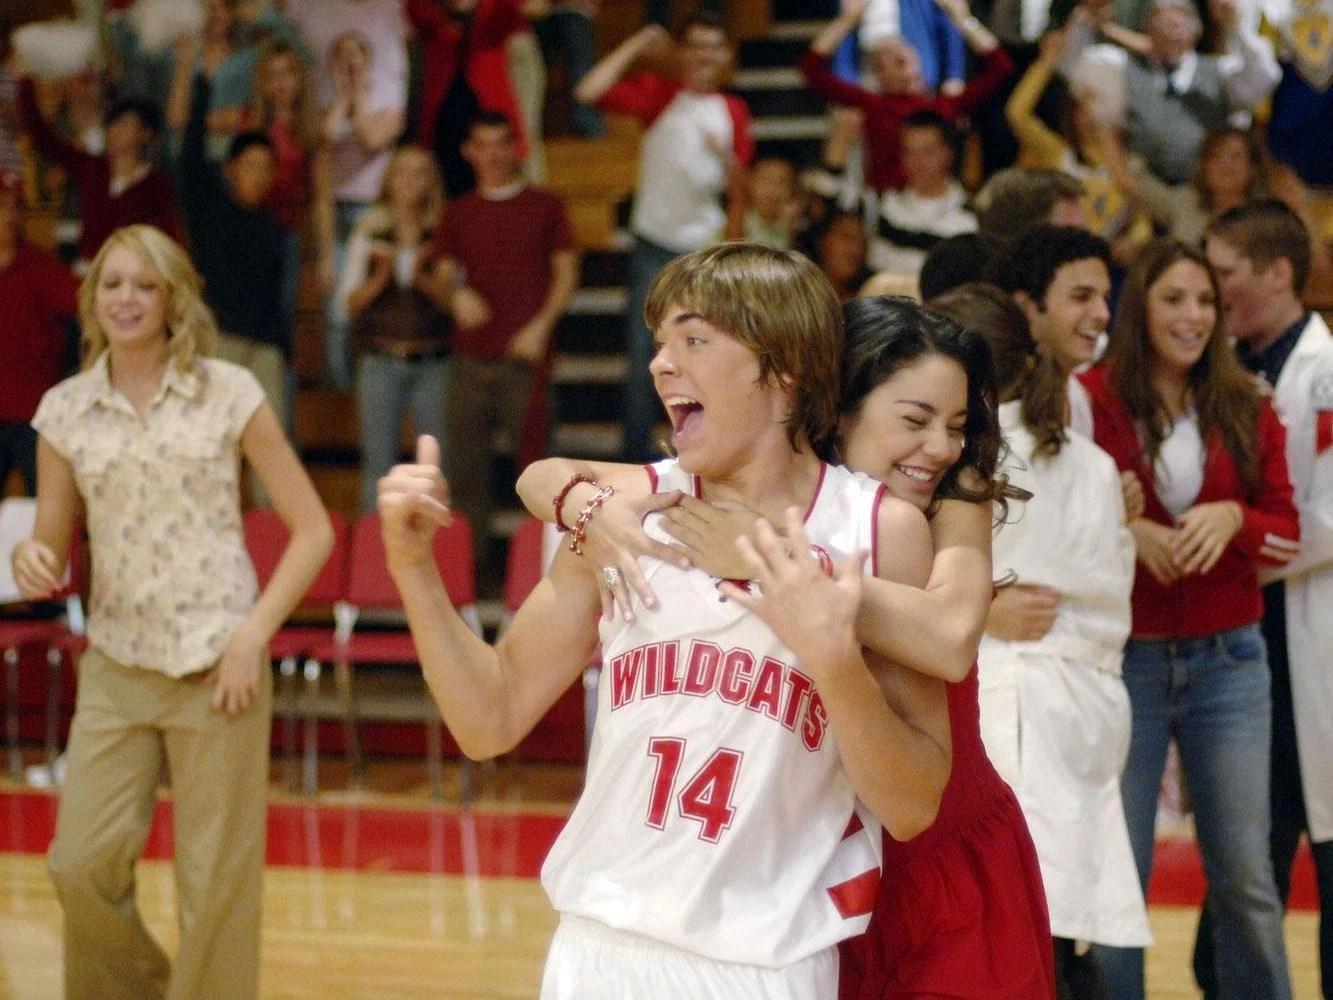 High School Musical 4 Disney Announces Us Casting Call